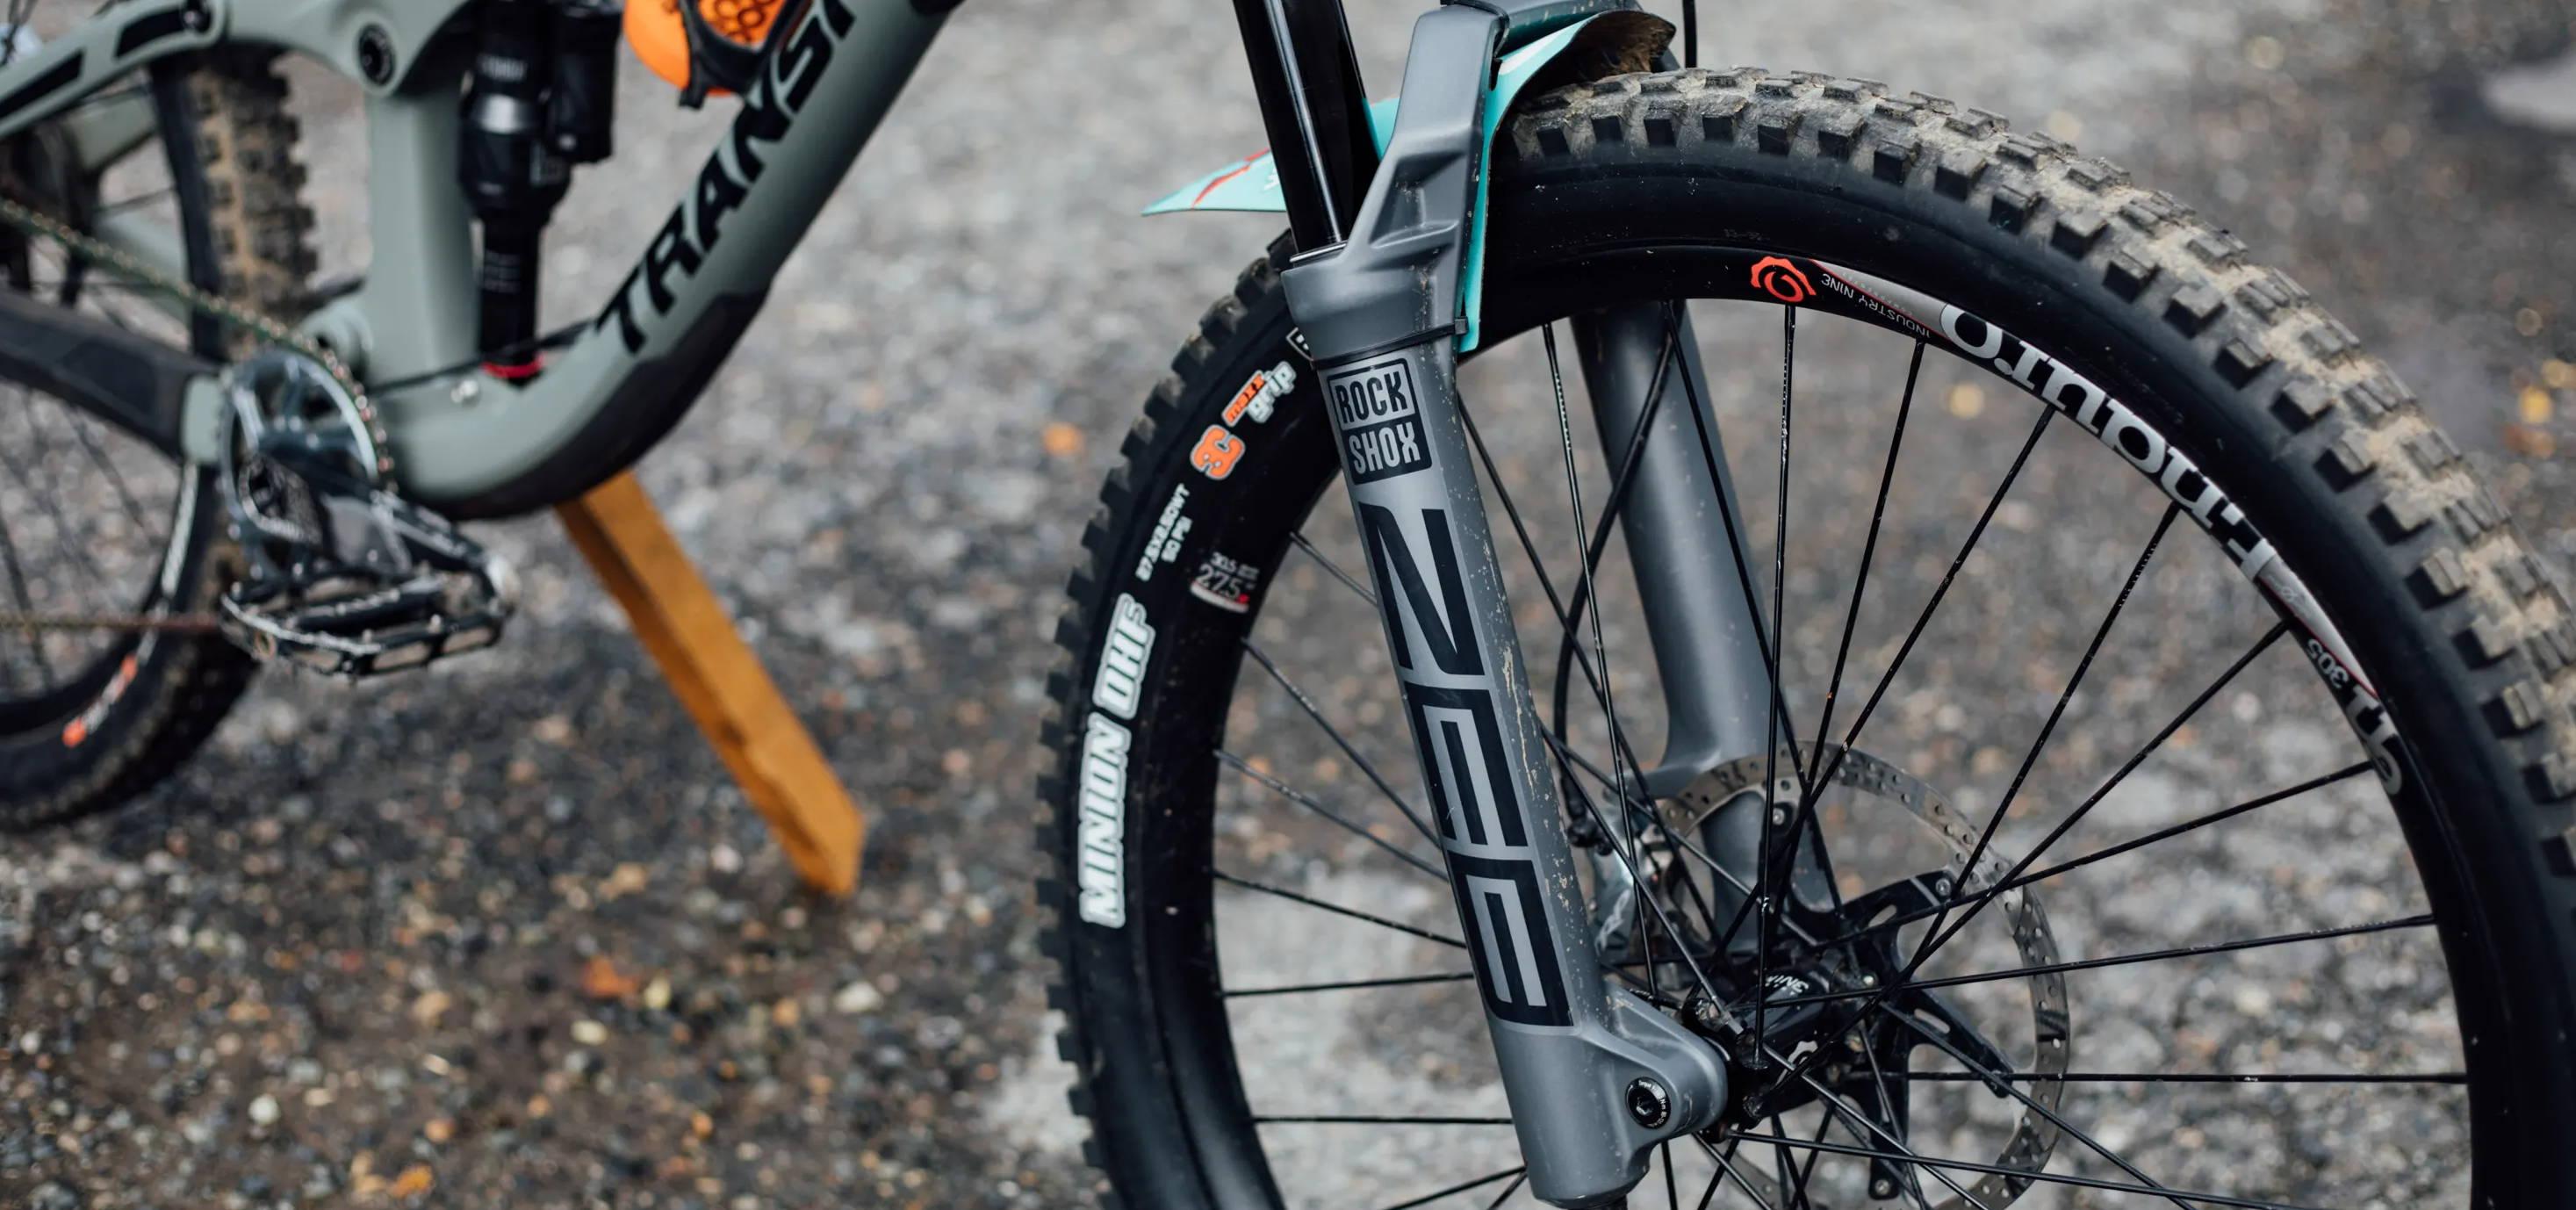 trrockshox zeb ultimate slab grey on a transition patrol review long term suspension fork mtb mountain bike  charger rc2 damper